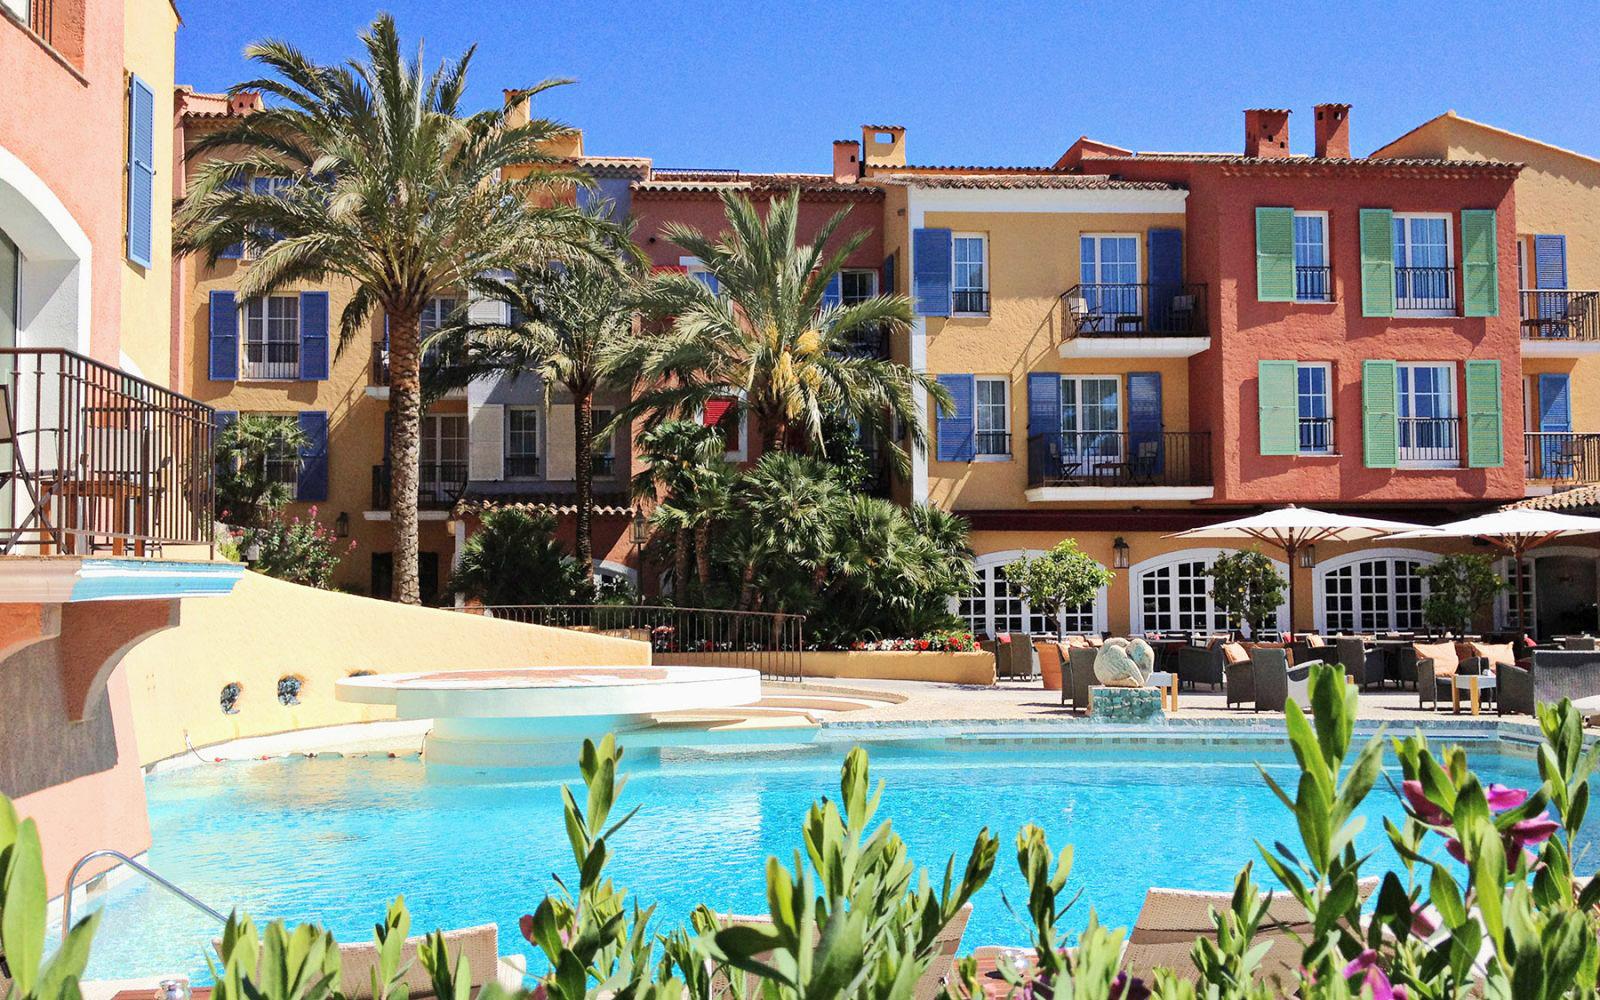 Restaurant l'Arcadia at the Byblos Saint-Tropez hotel